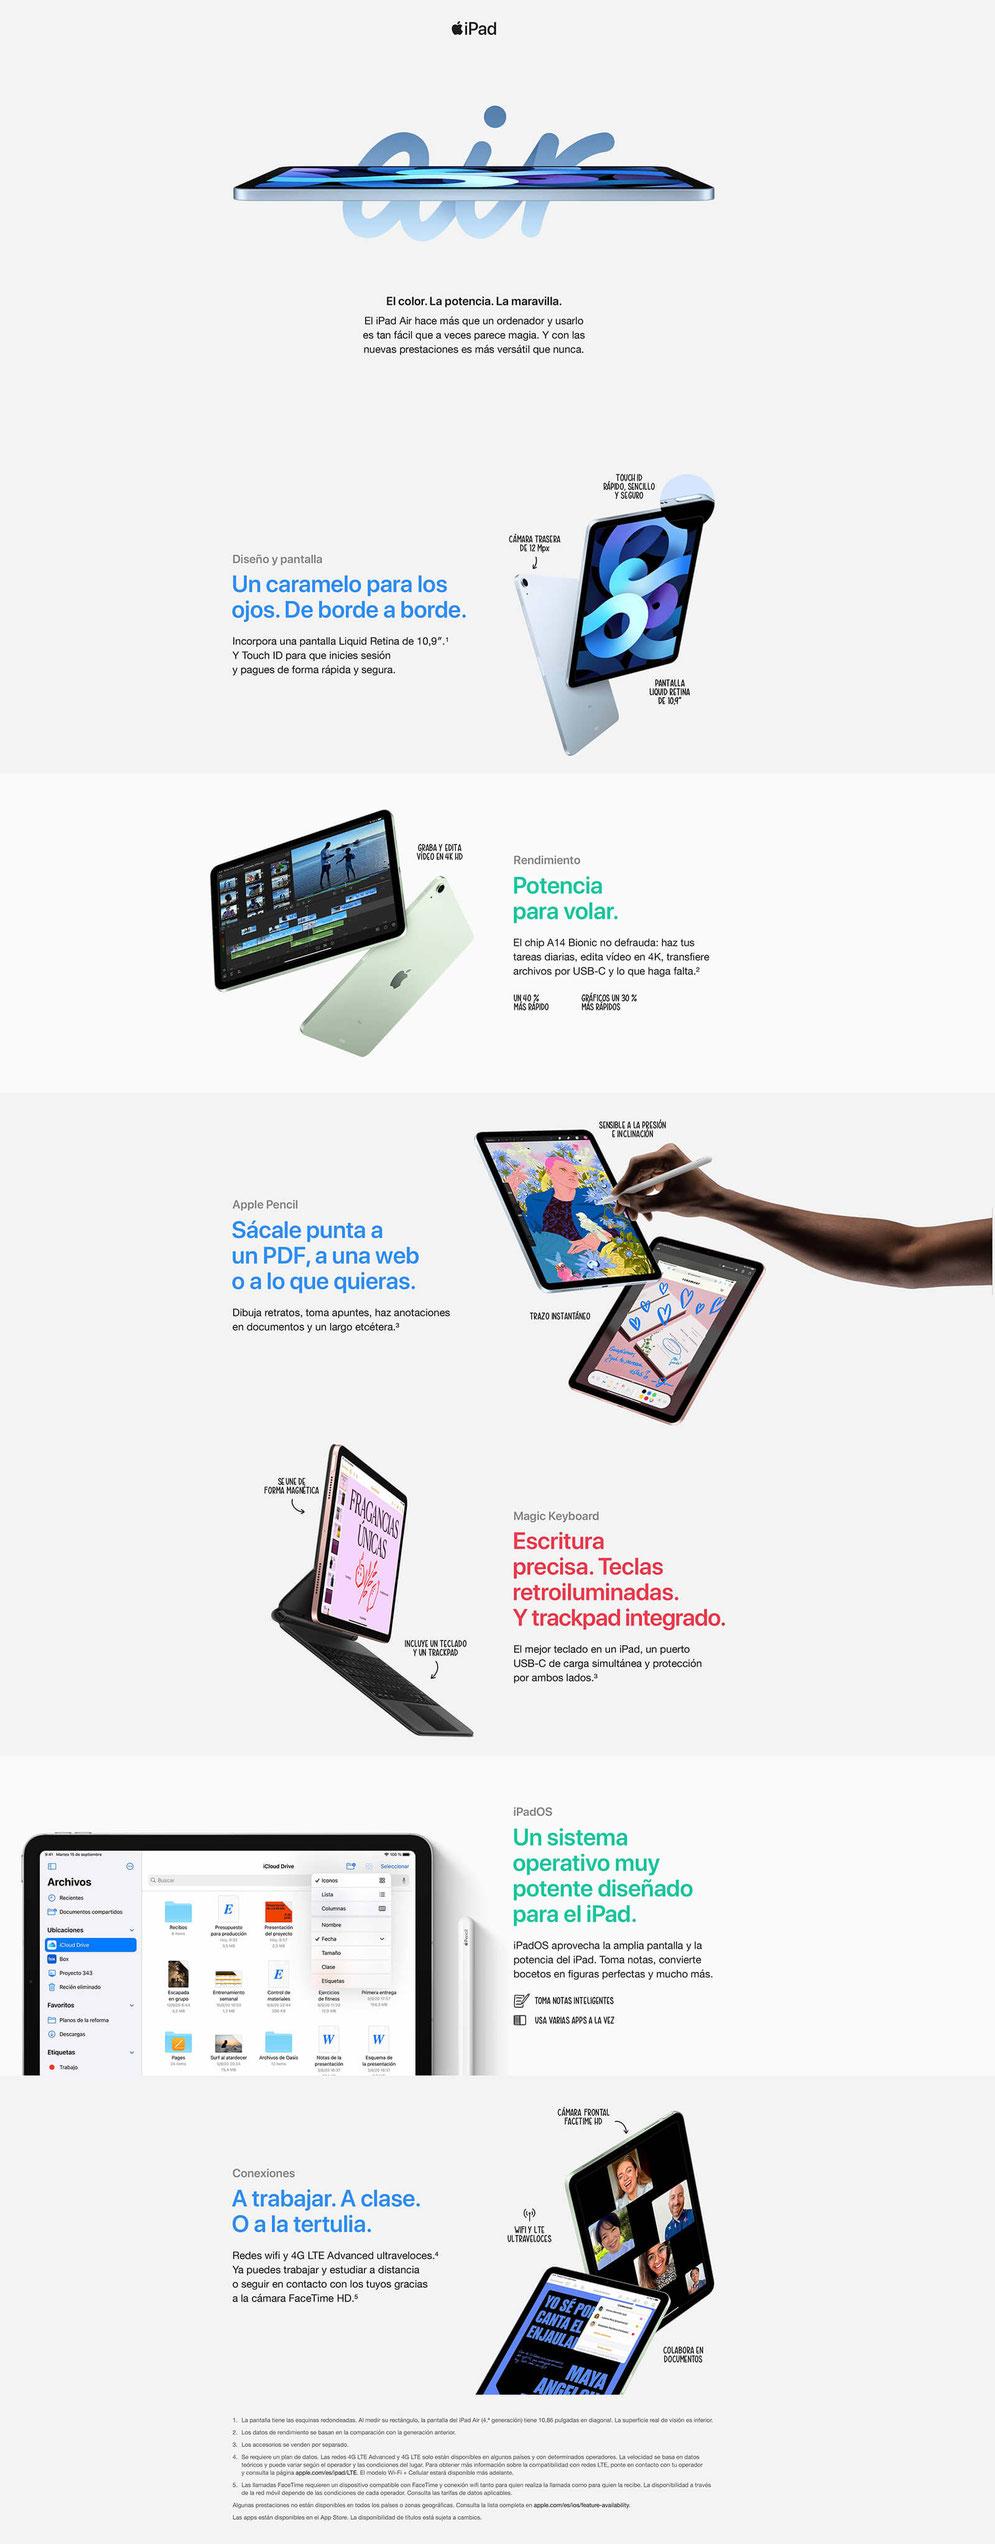 iPad Air 2020 de 64GB WiFi en Tenerife